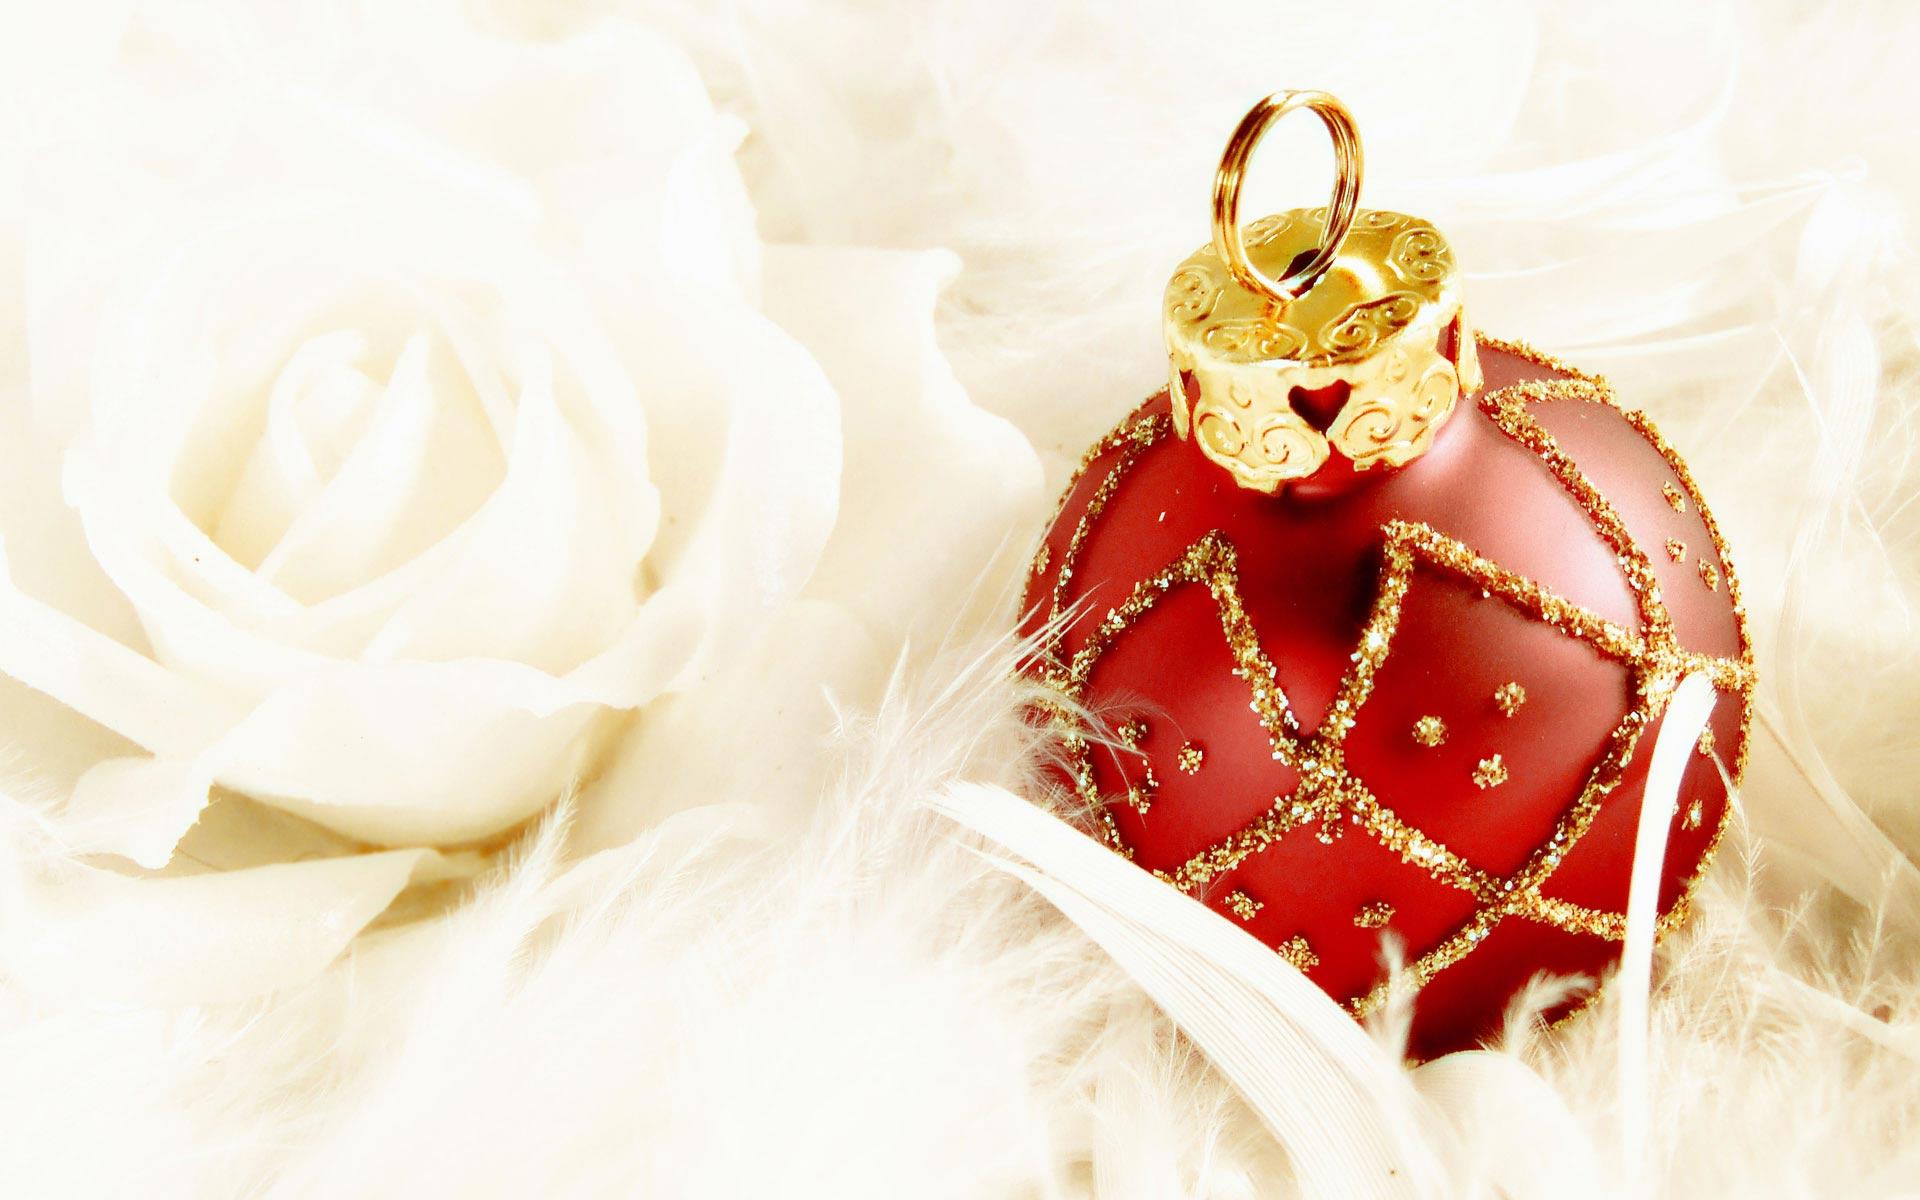 Sfondi Natale - Sfondo Natale Pallina